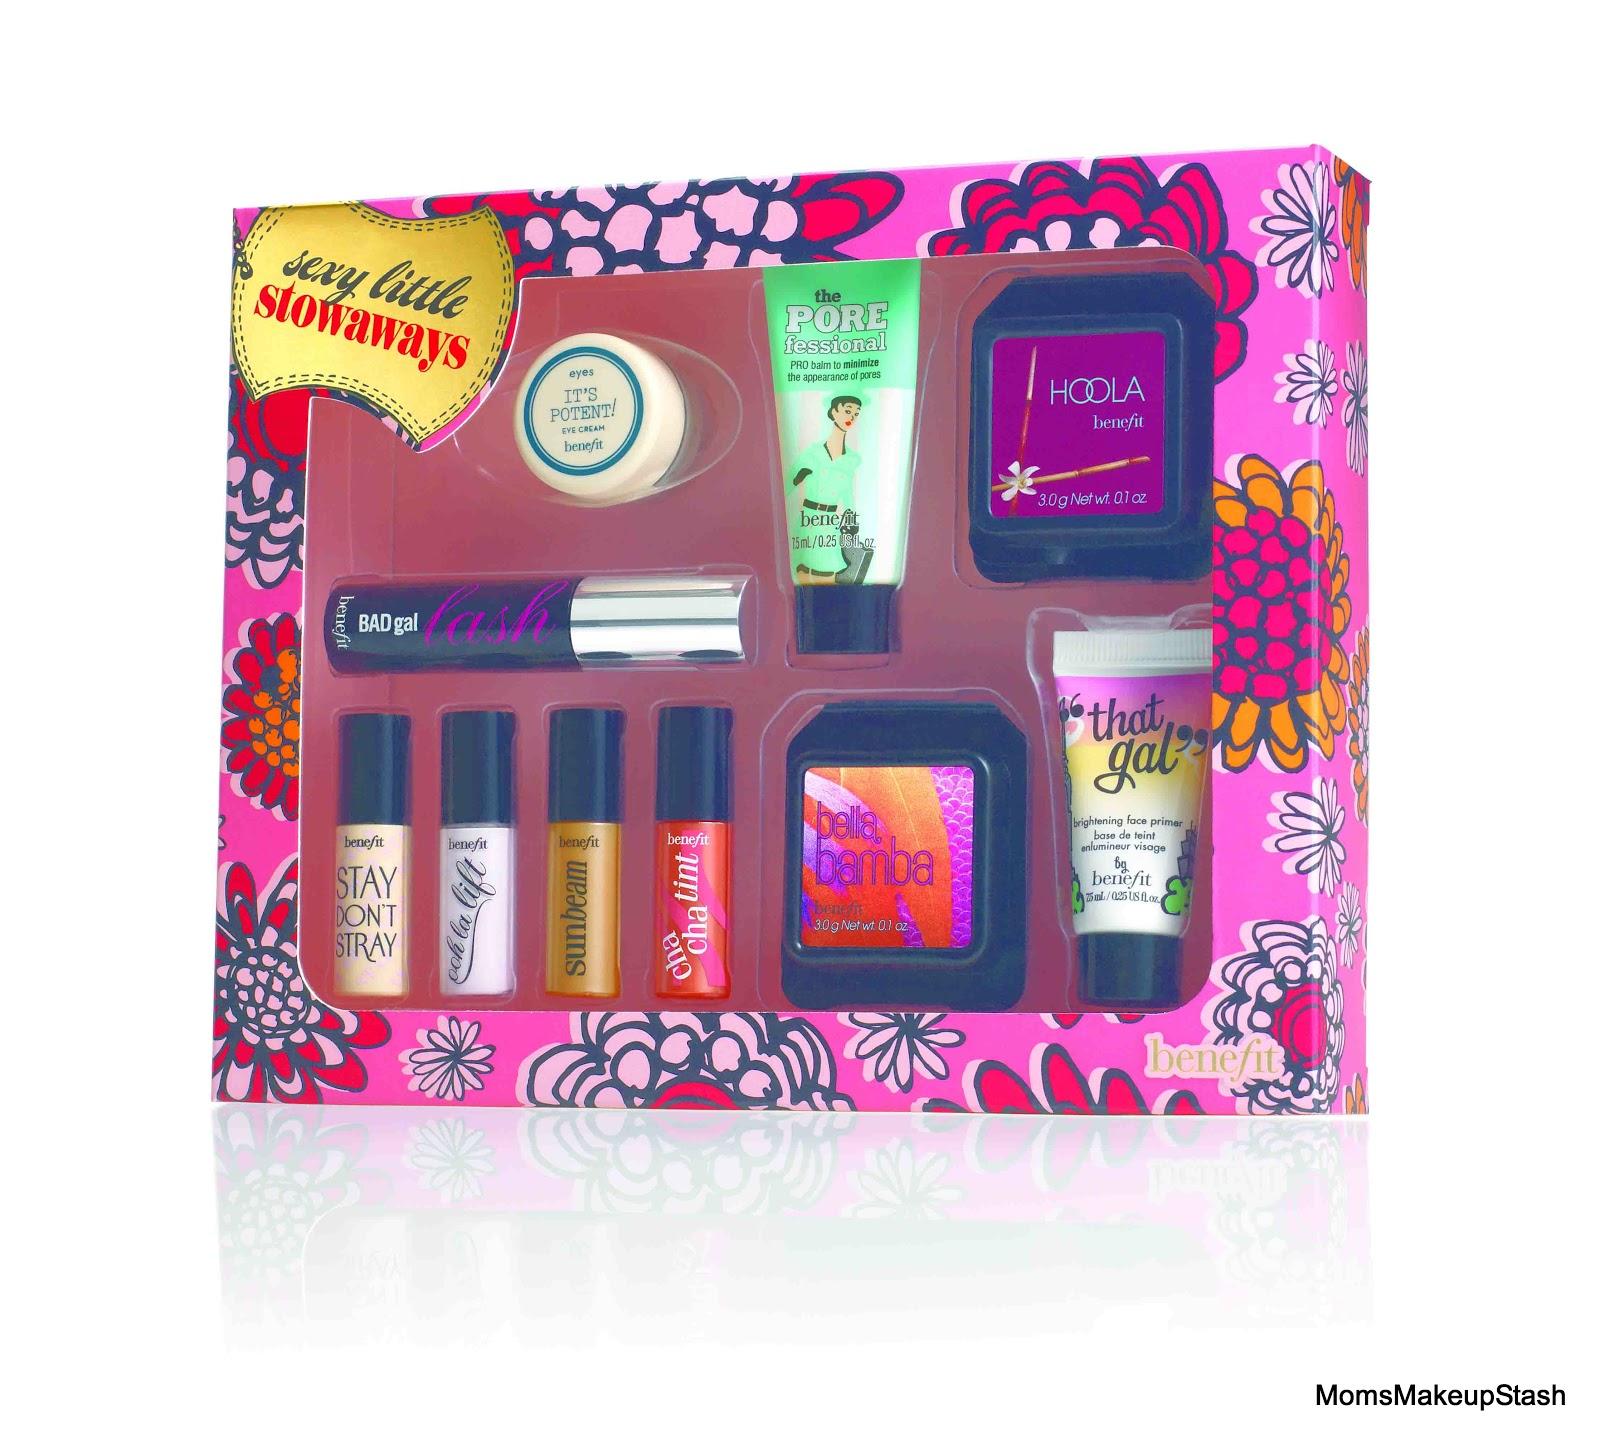 Benefit Cosmetics Holiday Gift Sets 2012 | Moms Makeup Stash